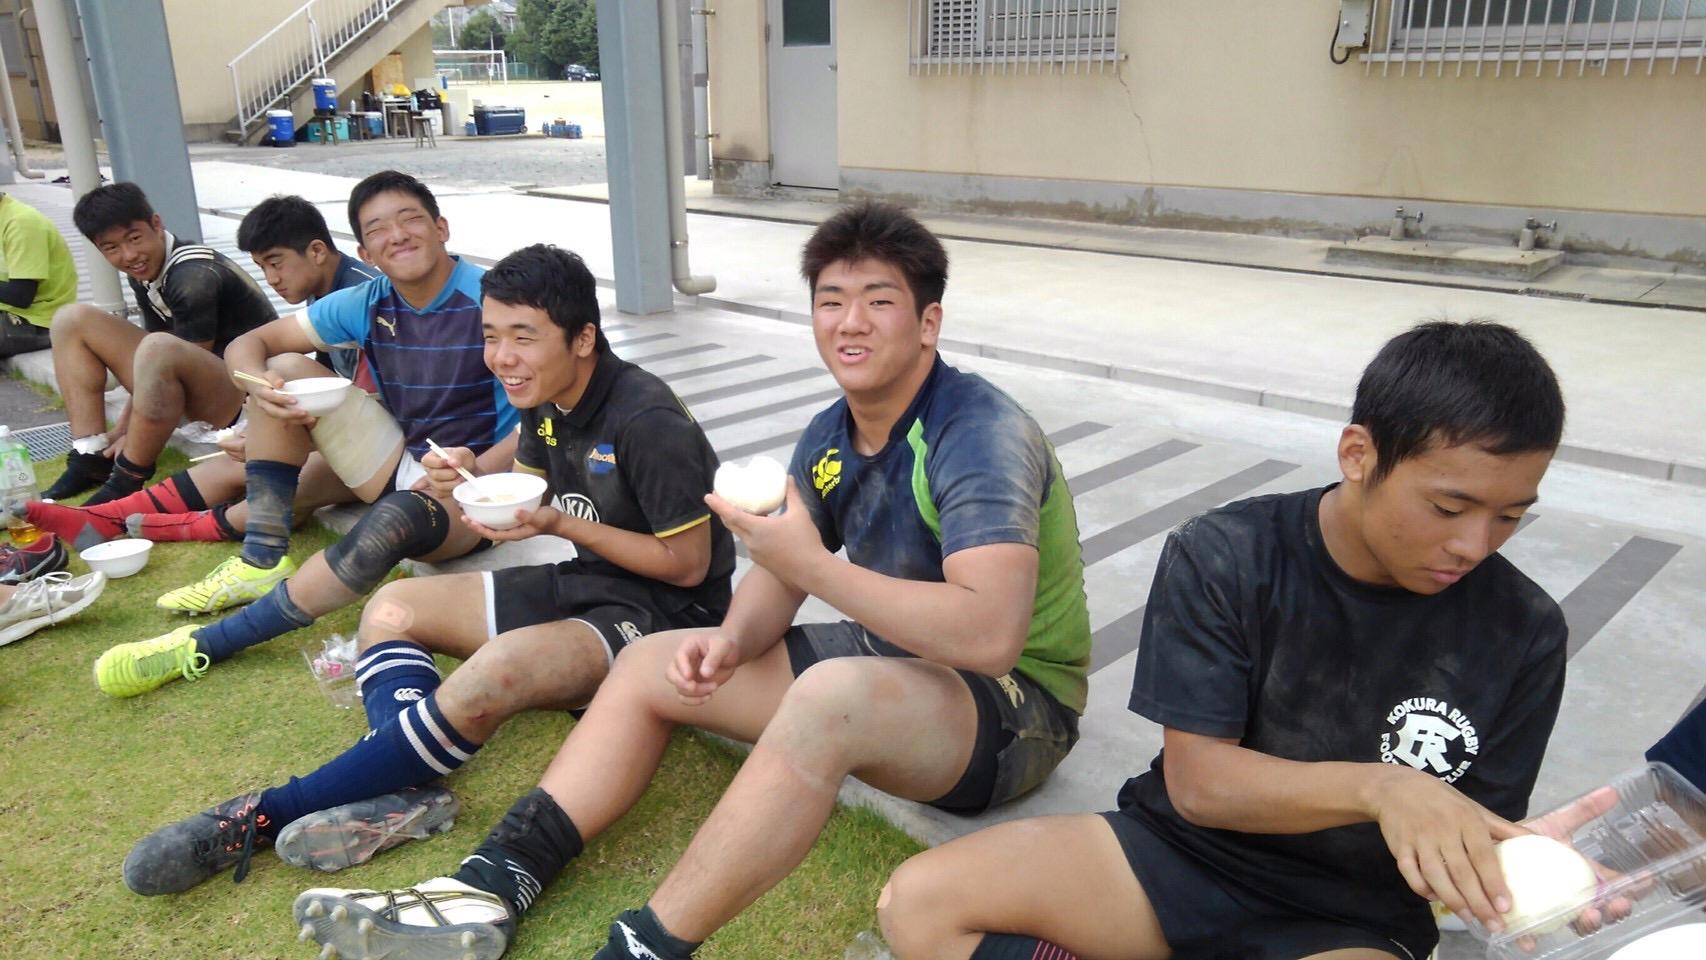 http://kokura-rugby.sakura.ne.jp/22_12.JPG